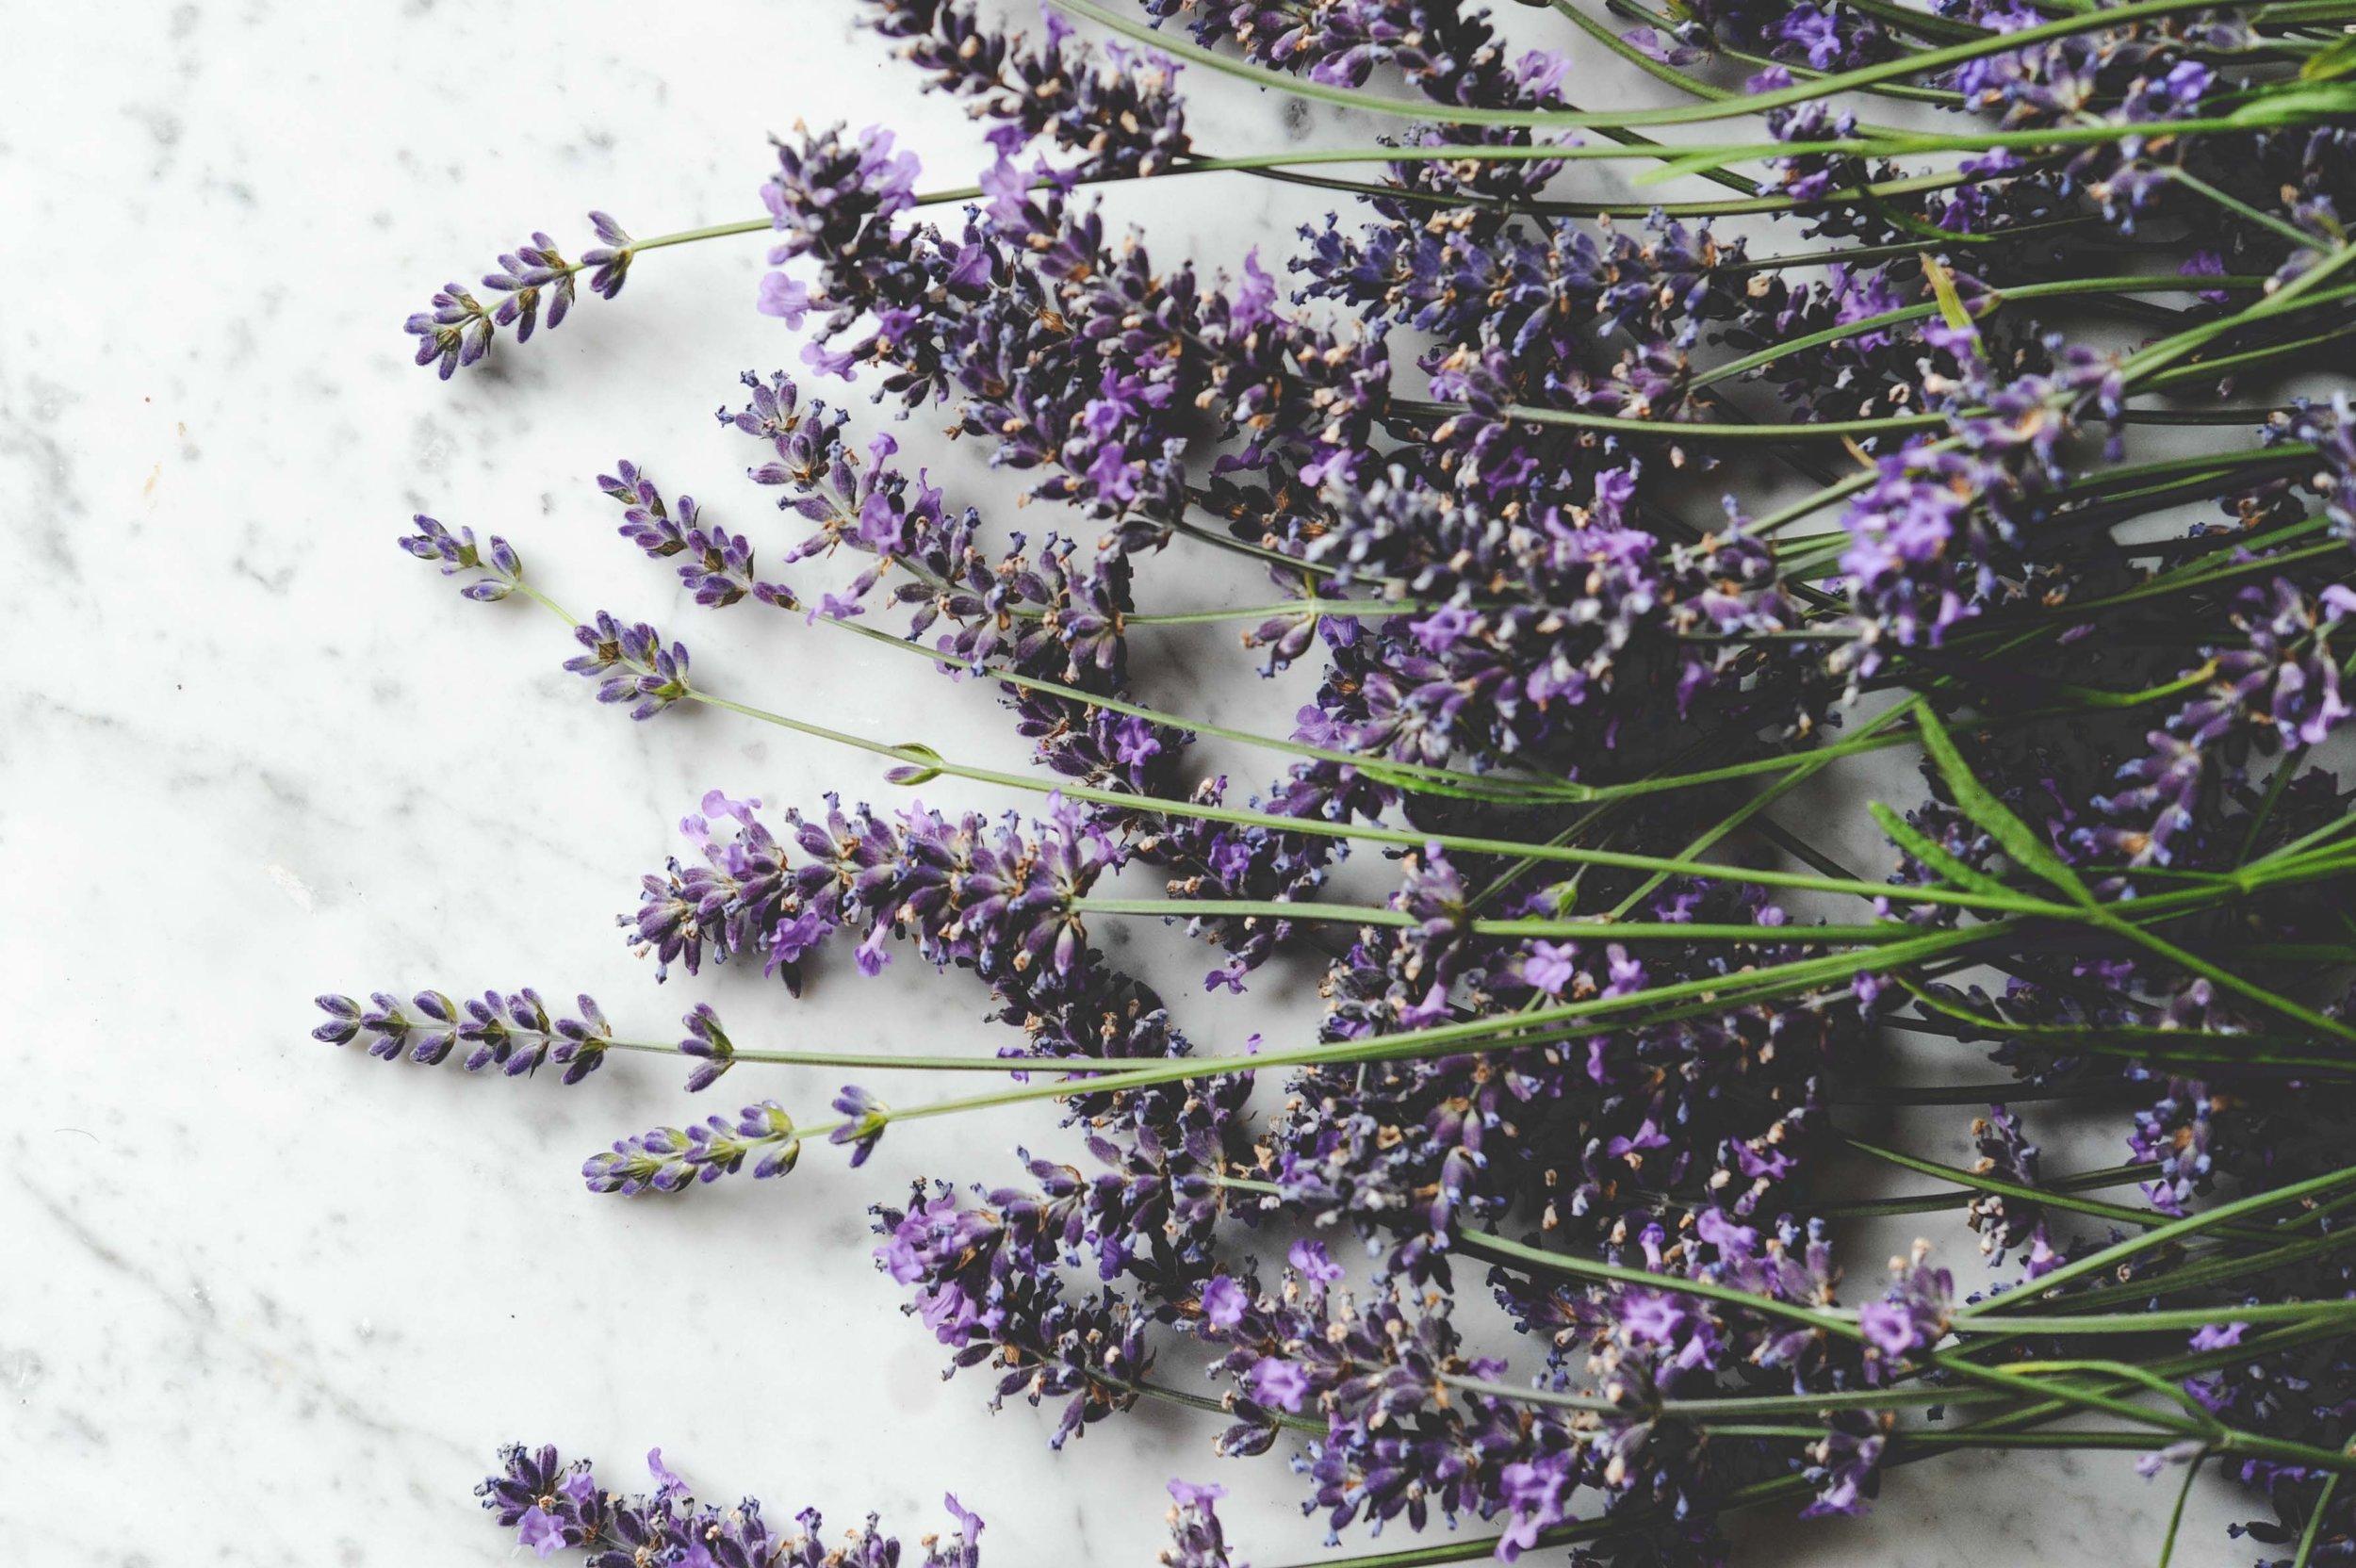 Lavender_Seattle Urban Farm Co.